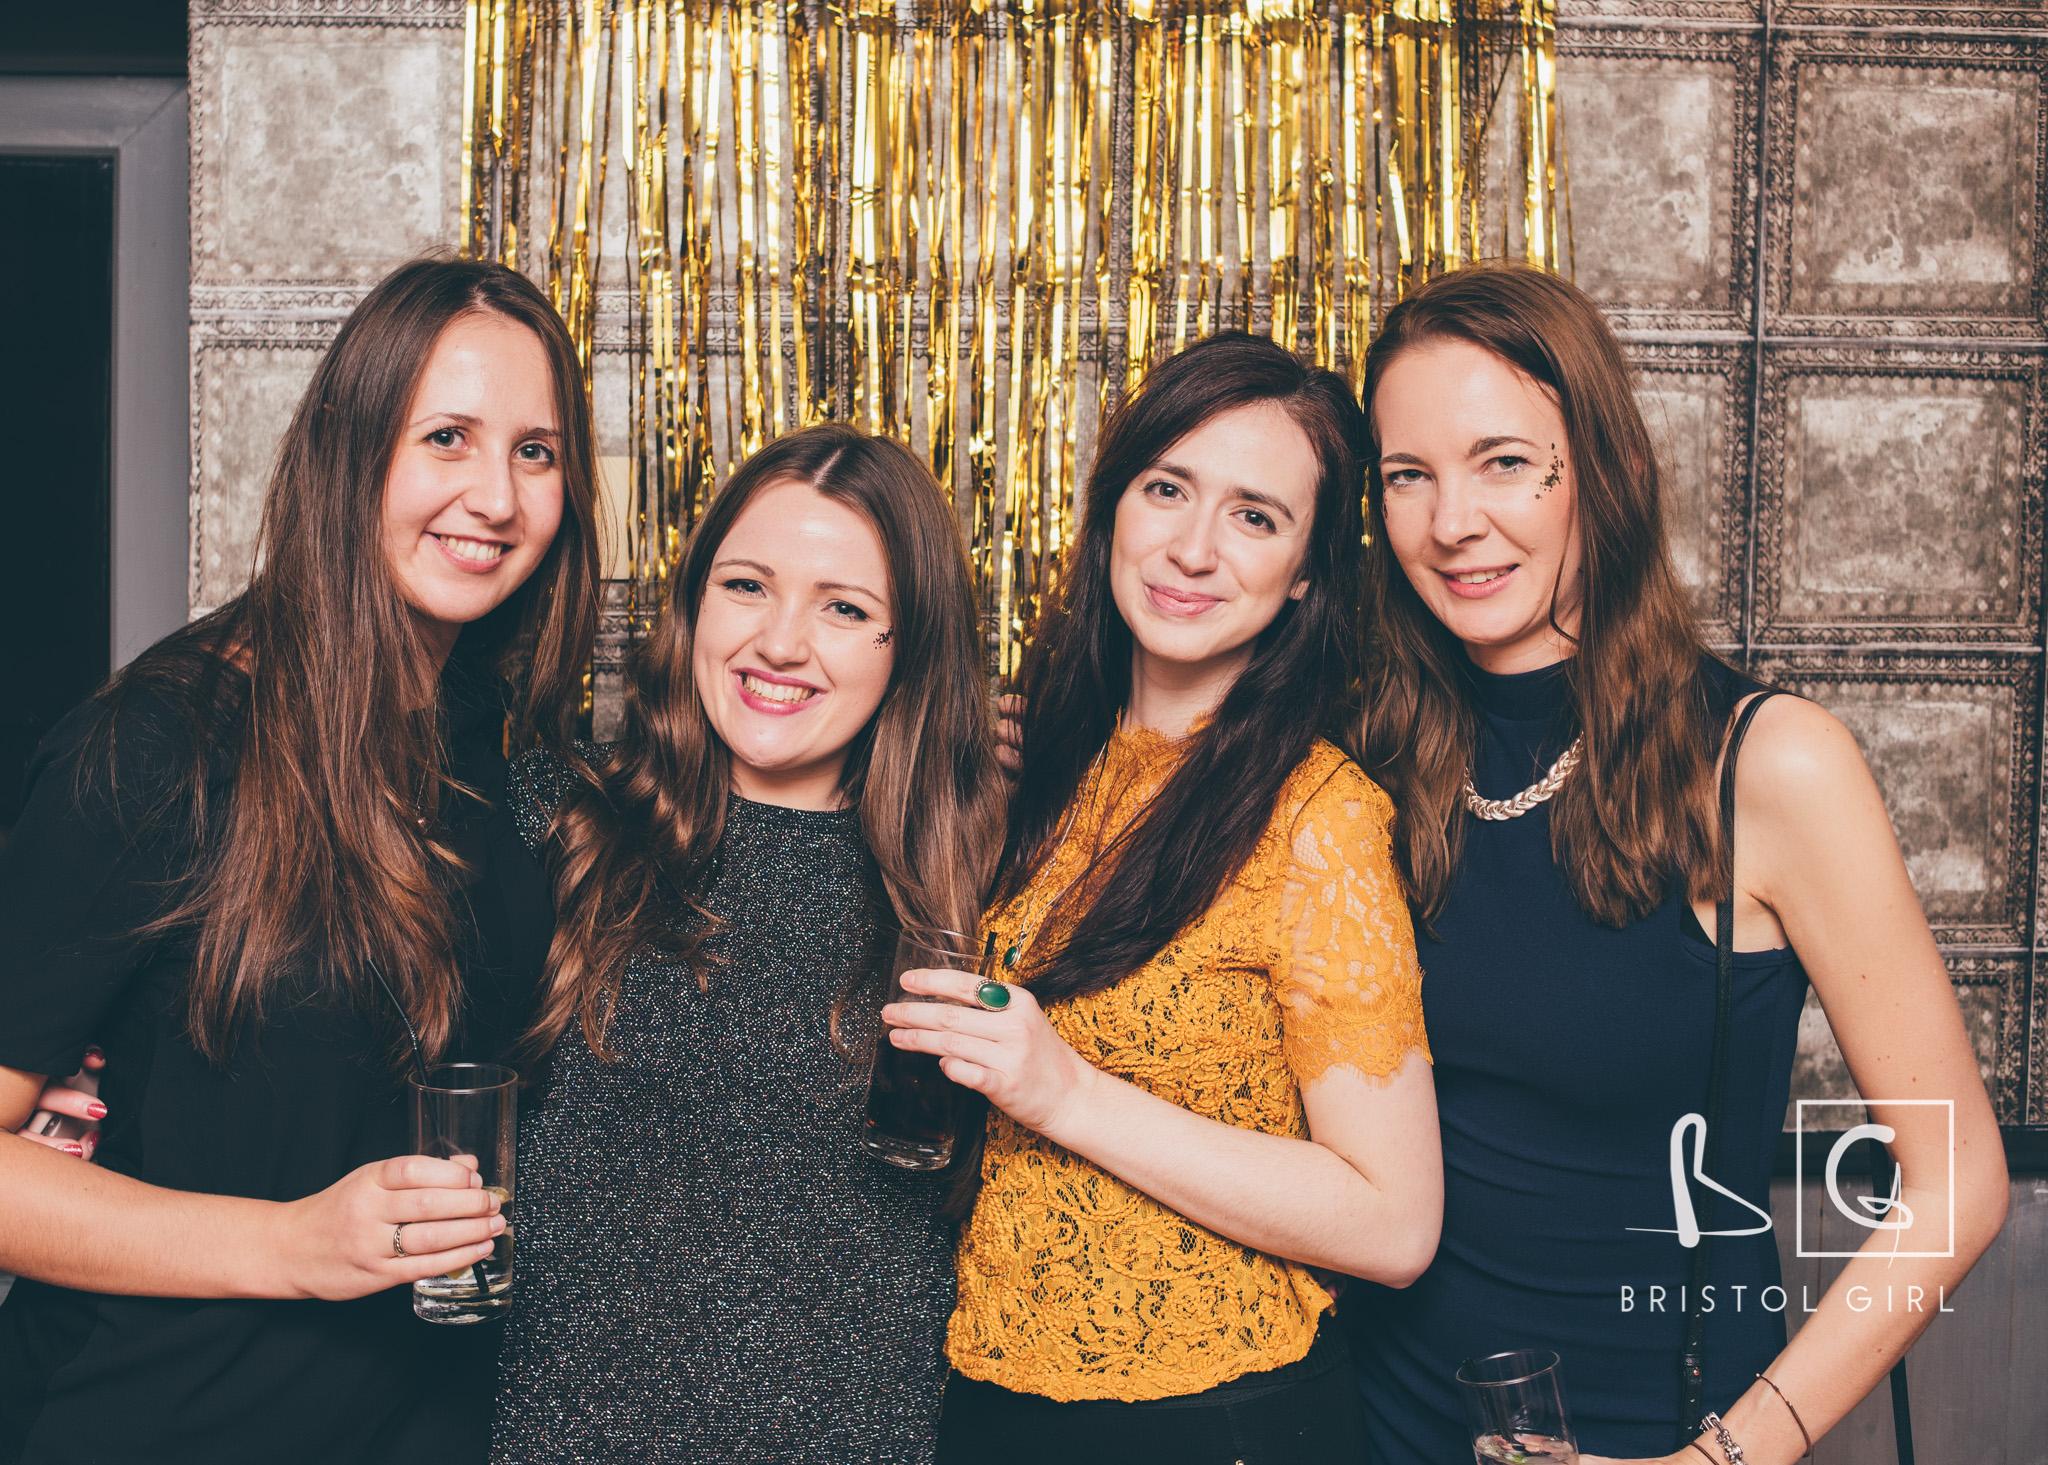 Bristol-Girl-Christmas-Party-City-Girl-Network-11.jpg